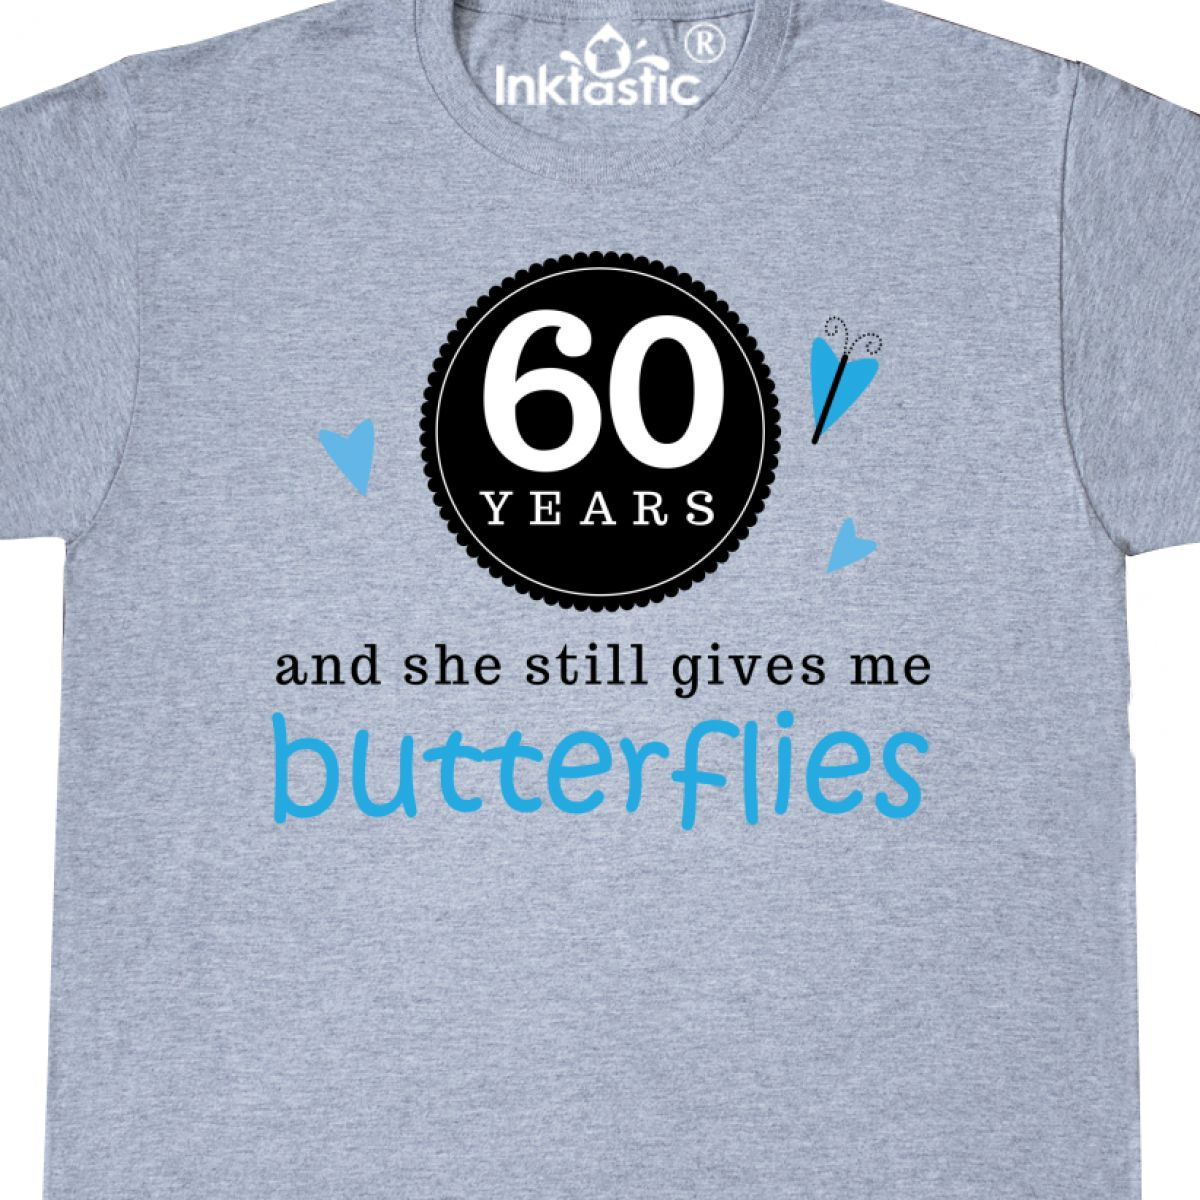 Inktastic 60th Anniversary Gift For Him T-Shirt Funny Wedding Idea 60 Year Mens